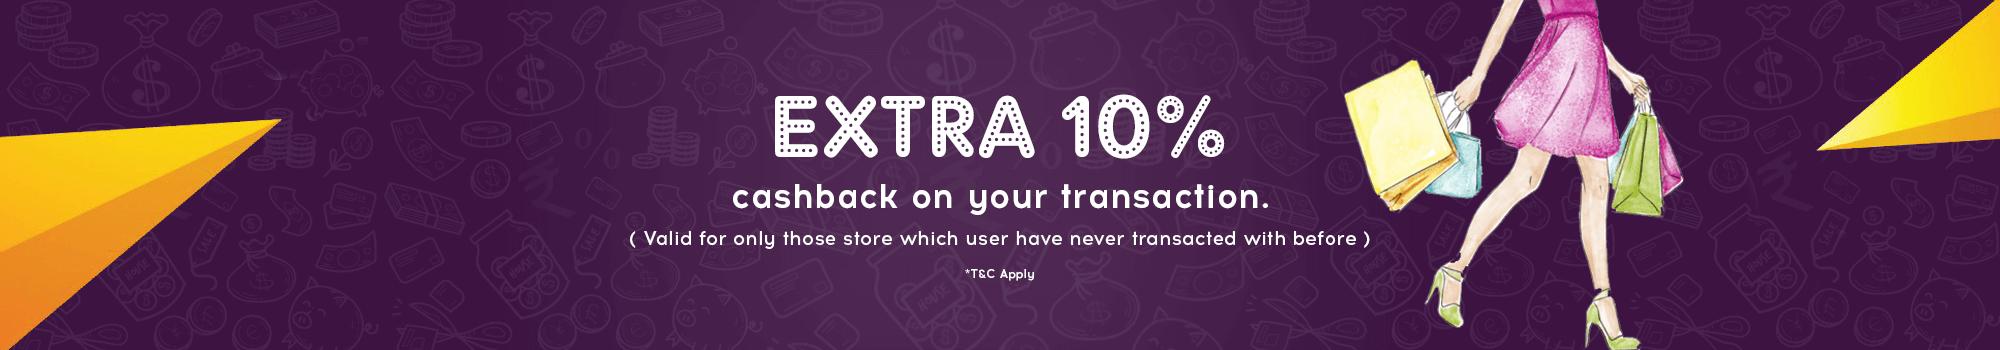 10 percent extra cashback